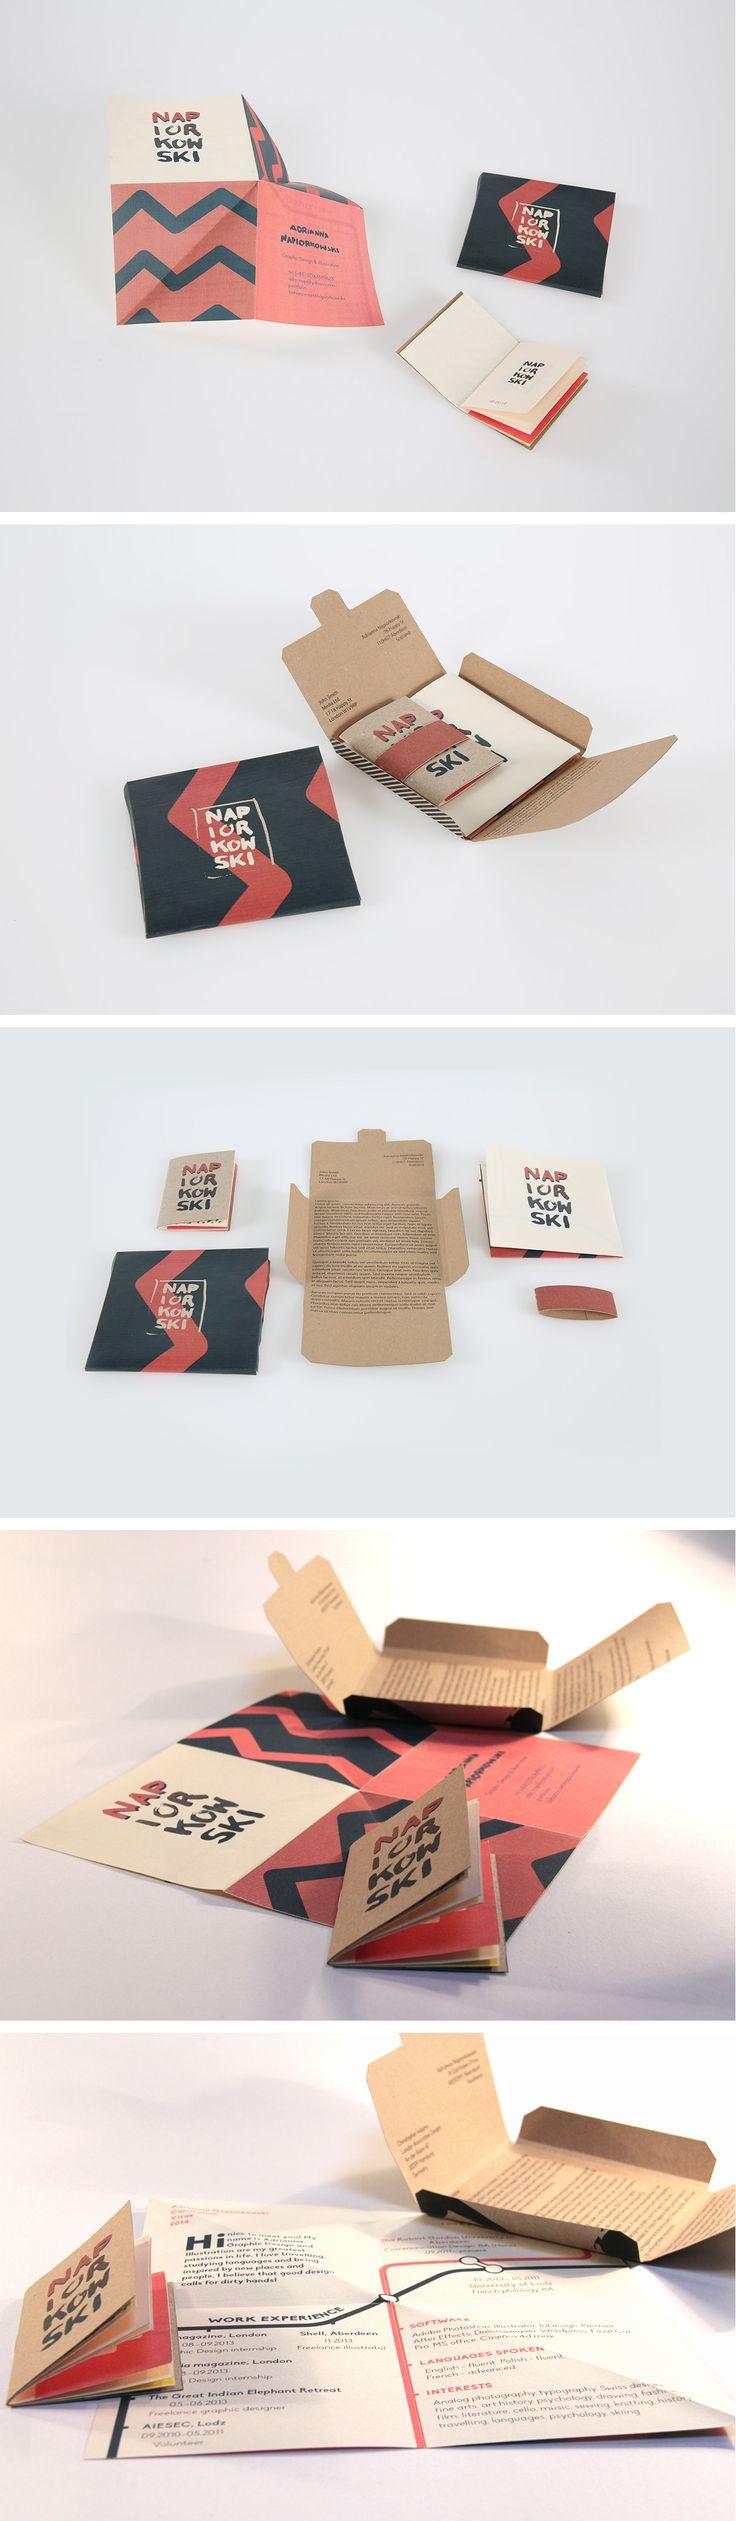 Self Promotion Pack by Adrianna Napiorkowski - #selfpromotion #portfolio